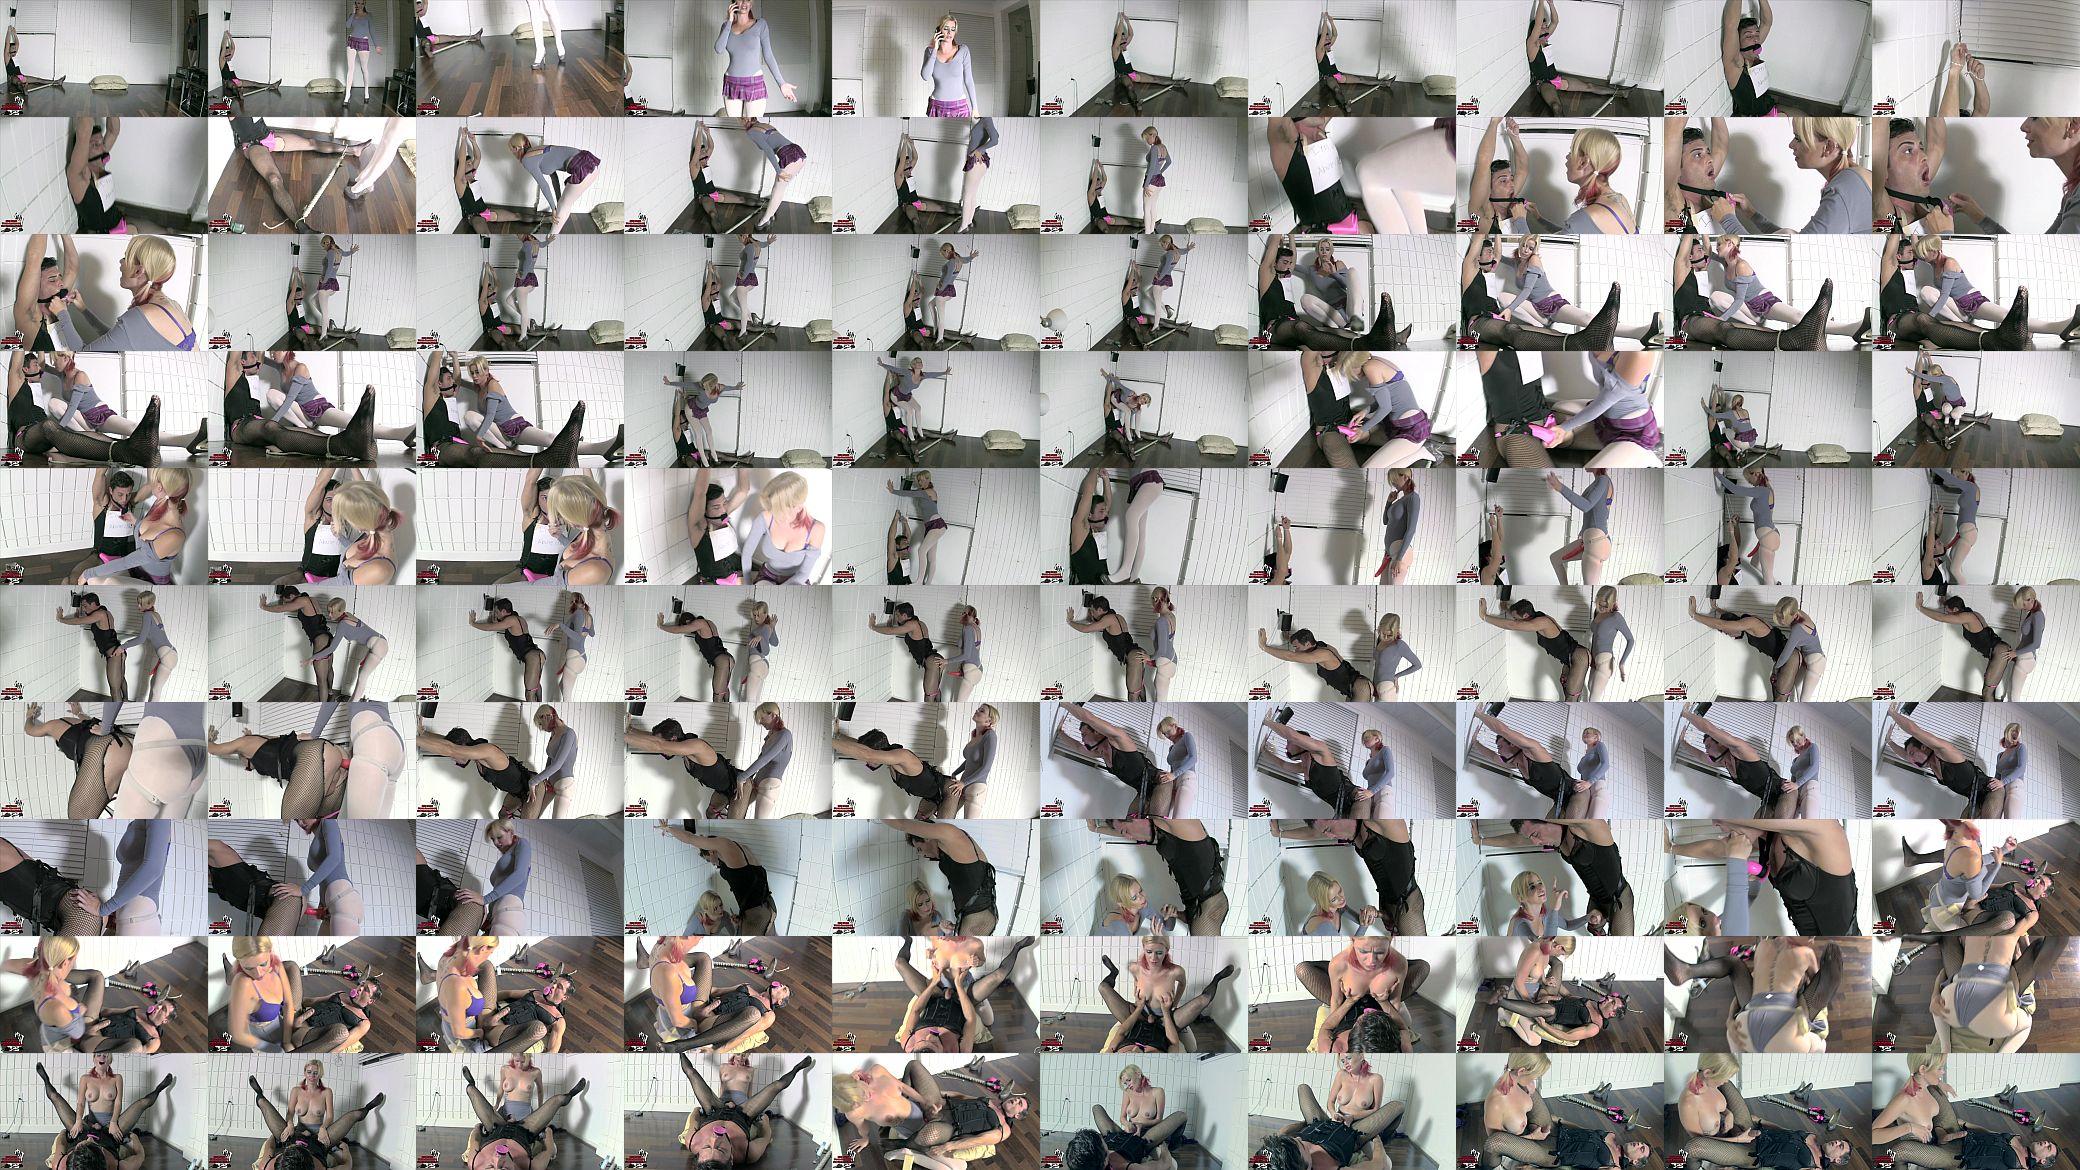 Horny milfs give handjob videos